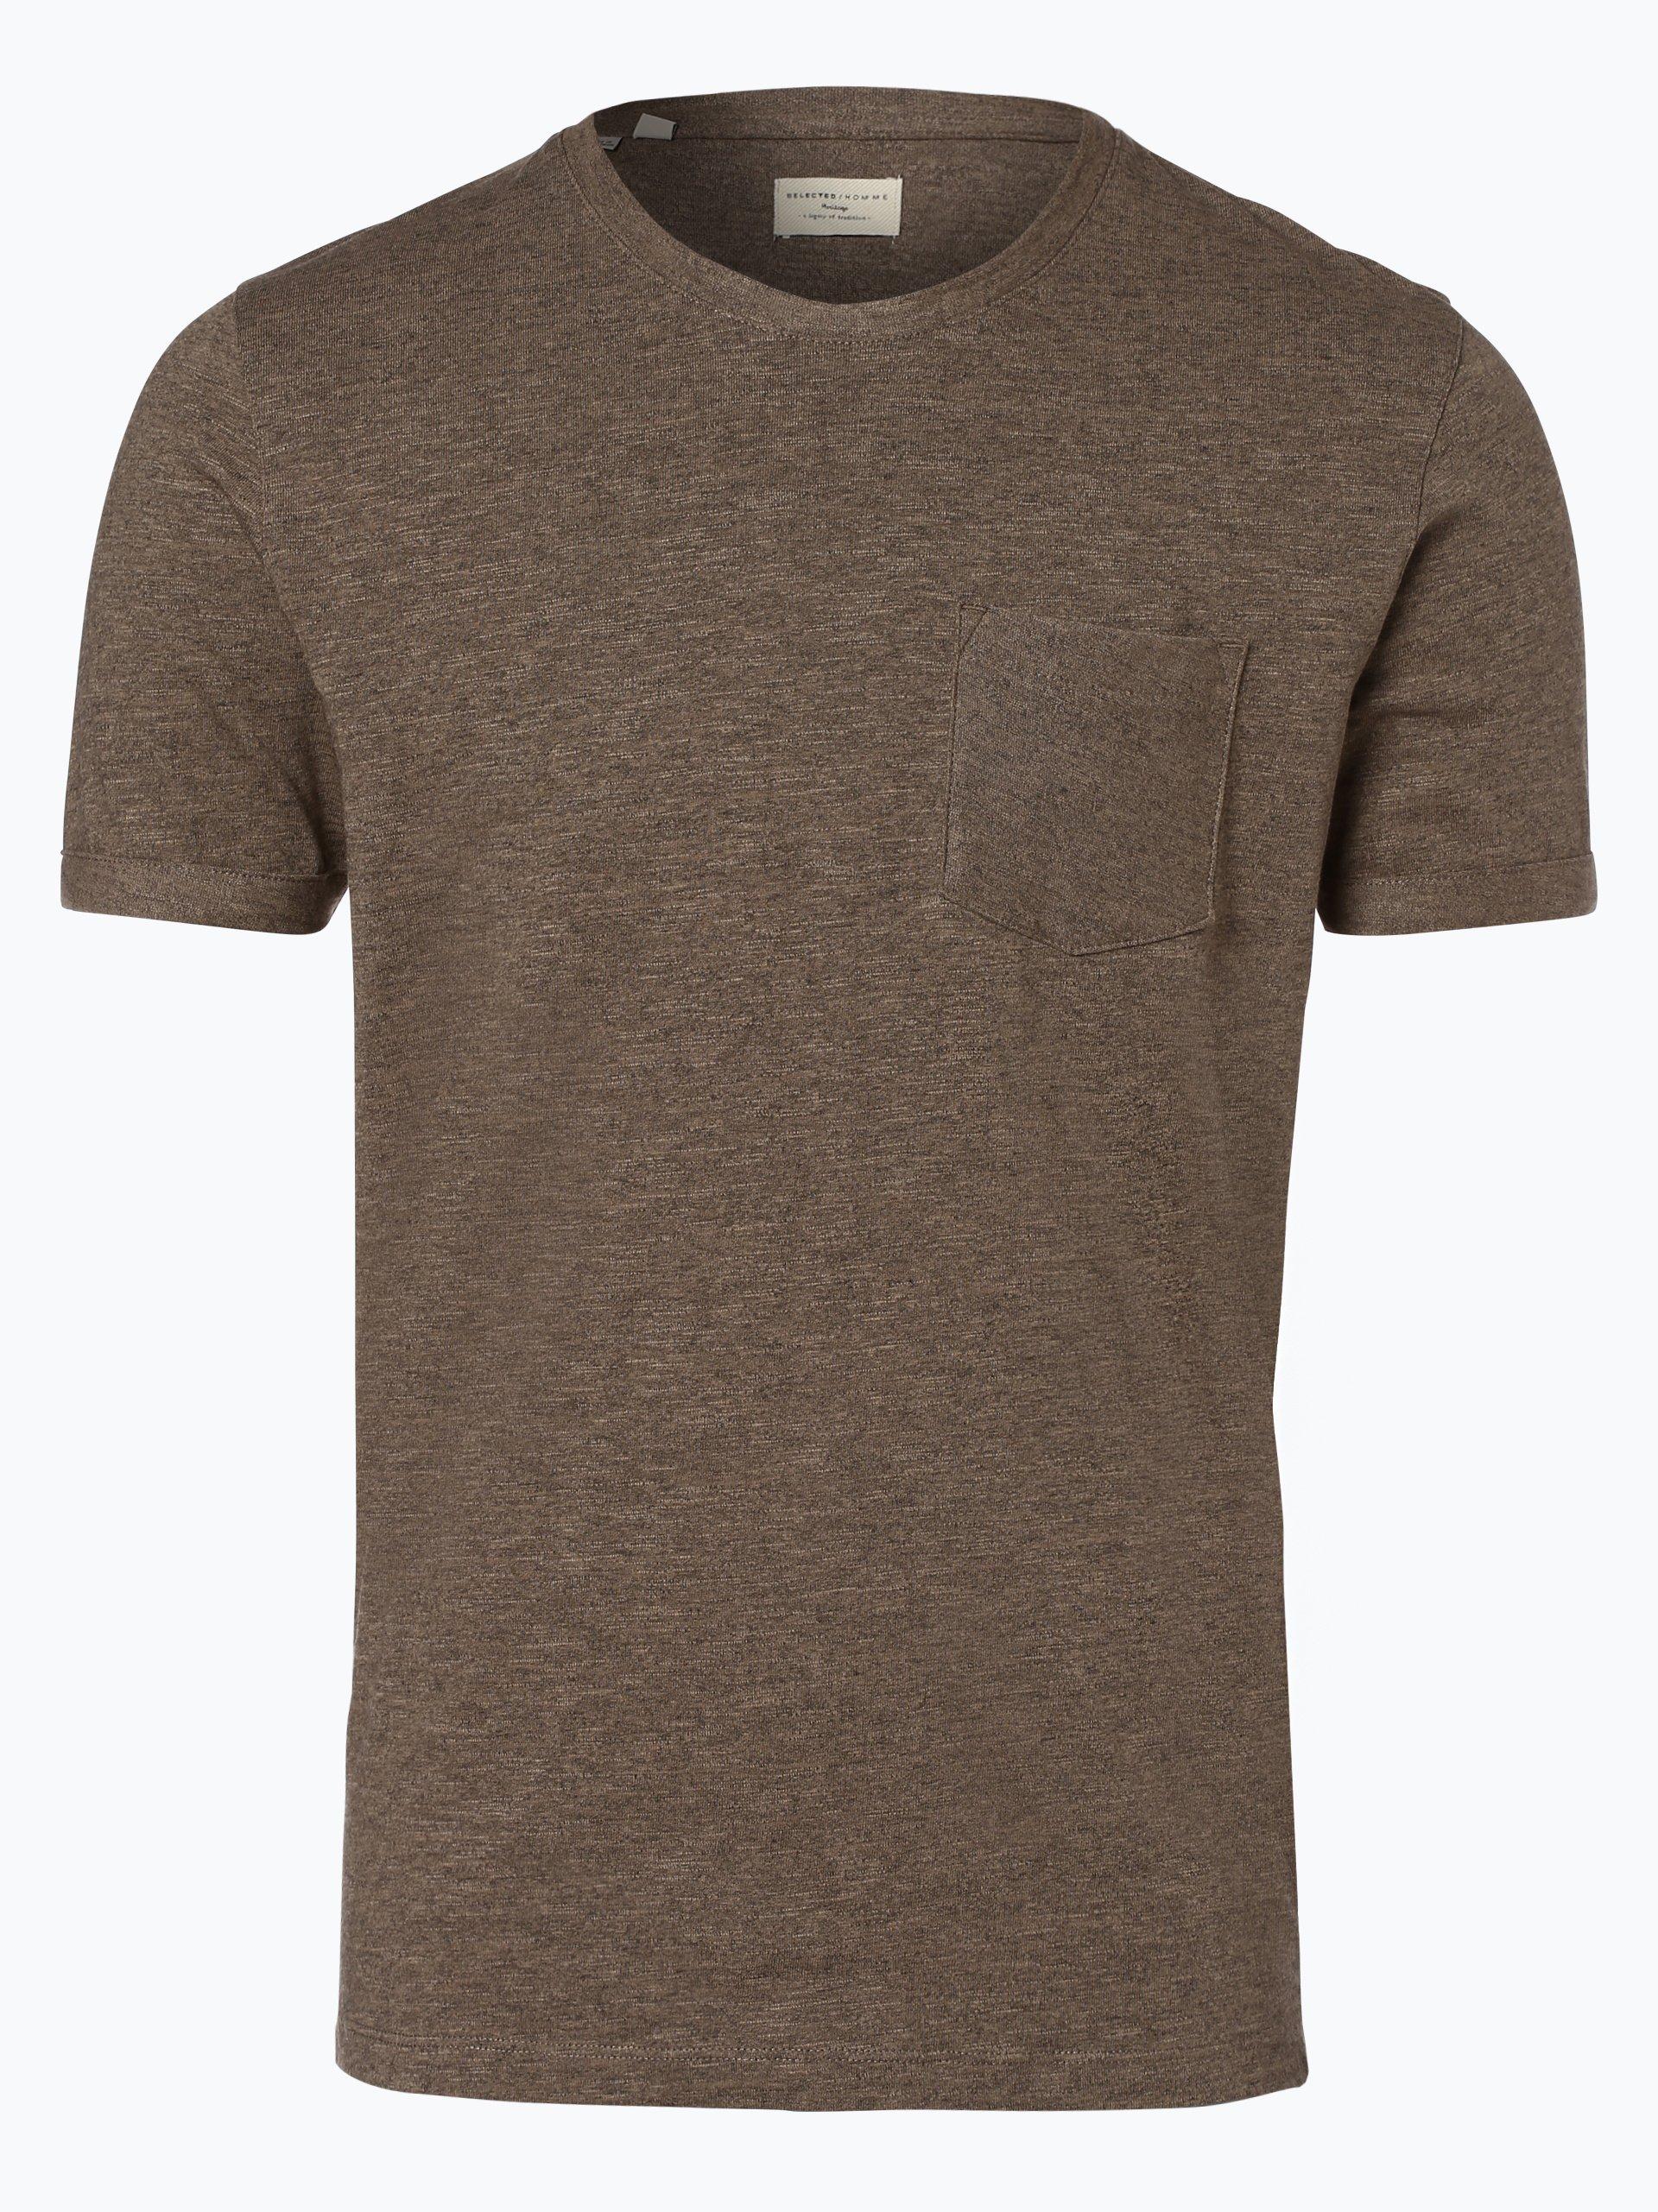 Selected T-shirt męski